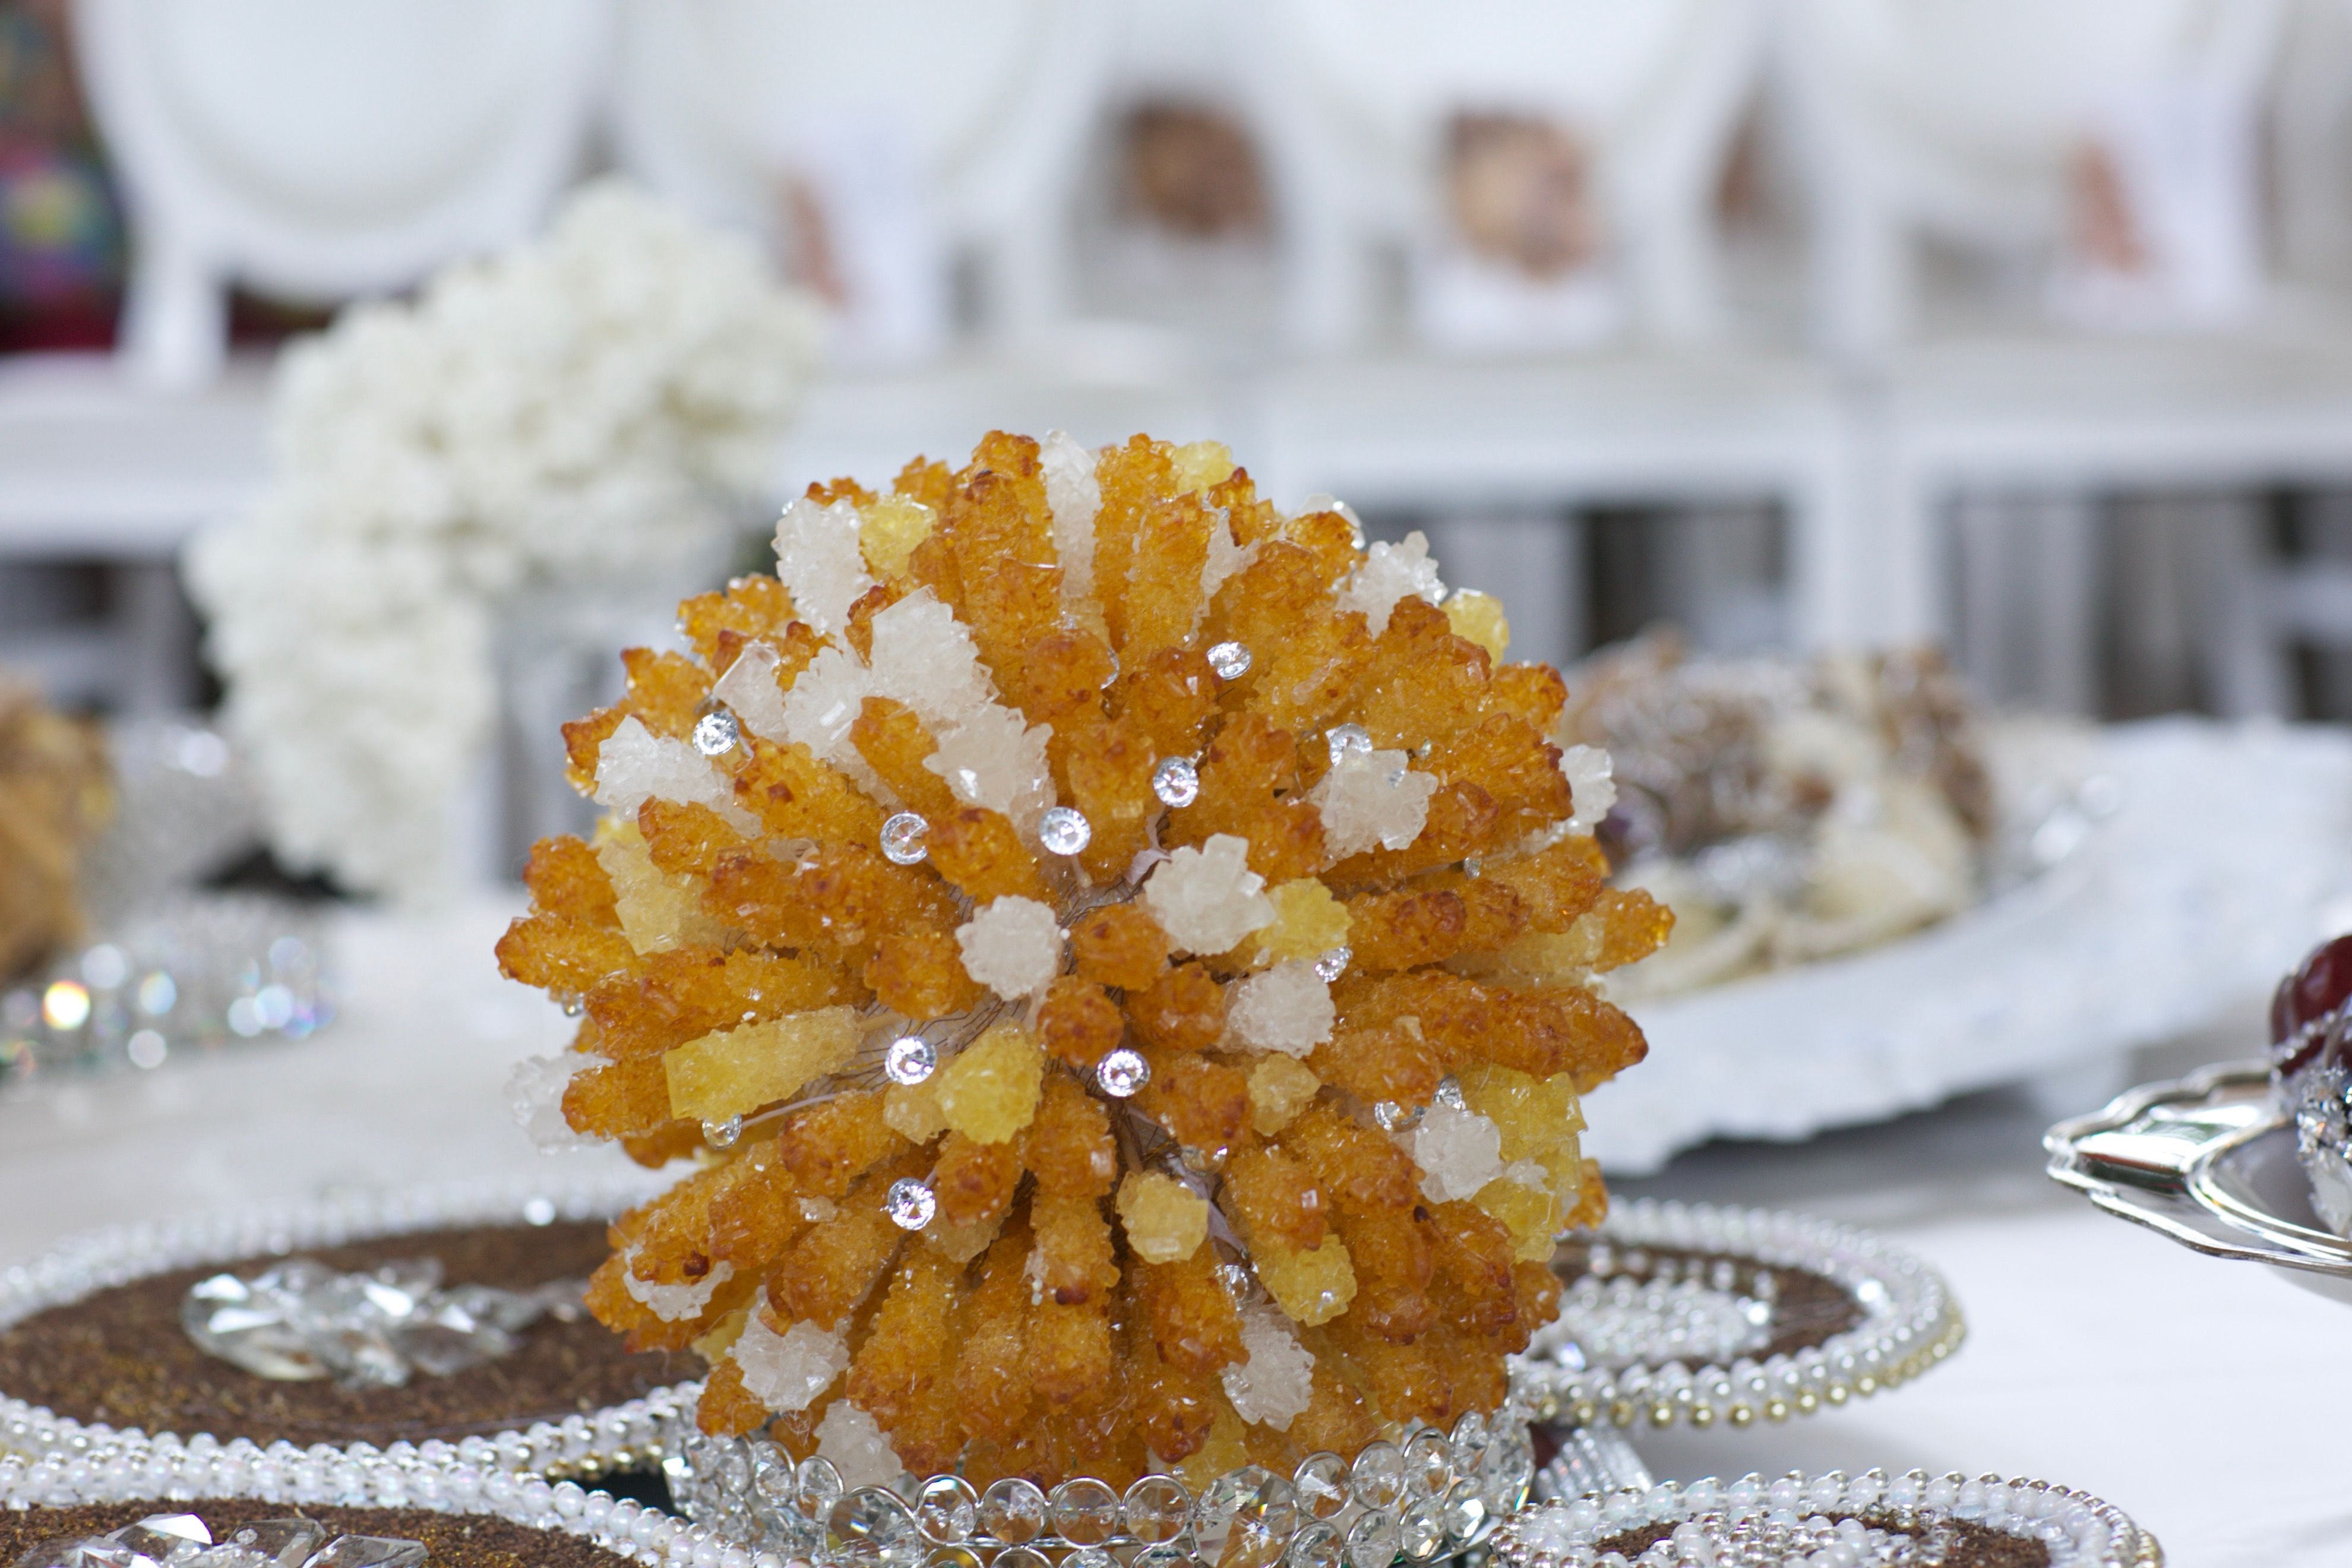 persianiranian aghdwedding sofre shakheh nabatt crystallized candy stick